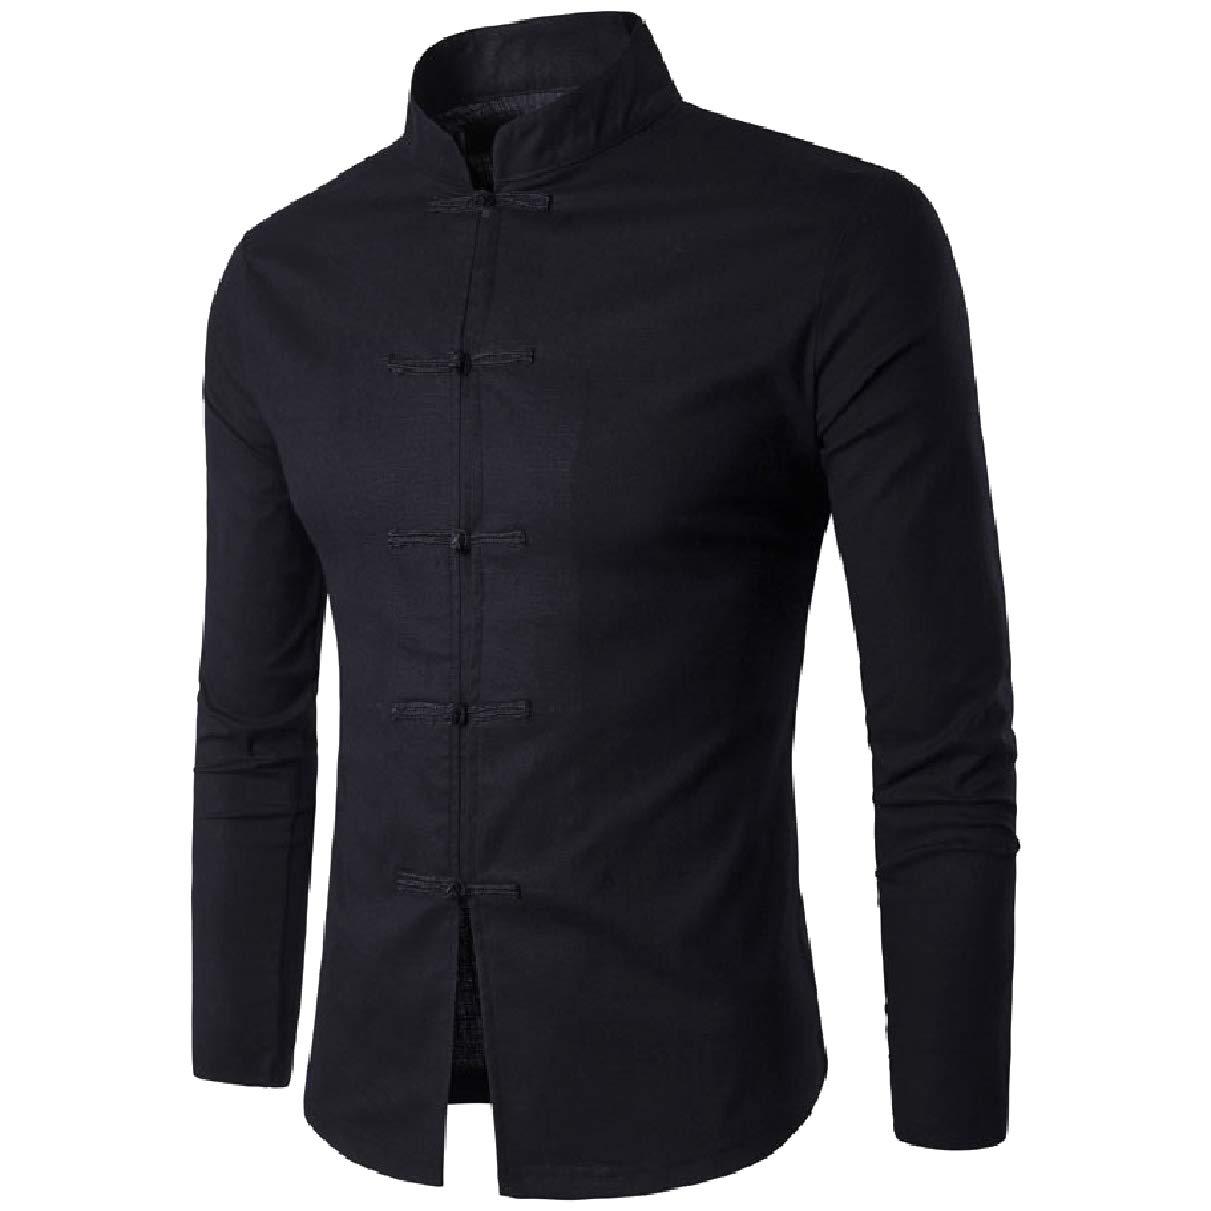 Coolred-Men Oversized Casual Leisure Solid Mandarin Collar Western Shirt